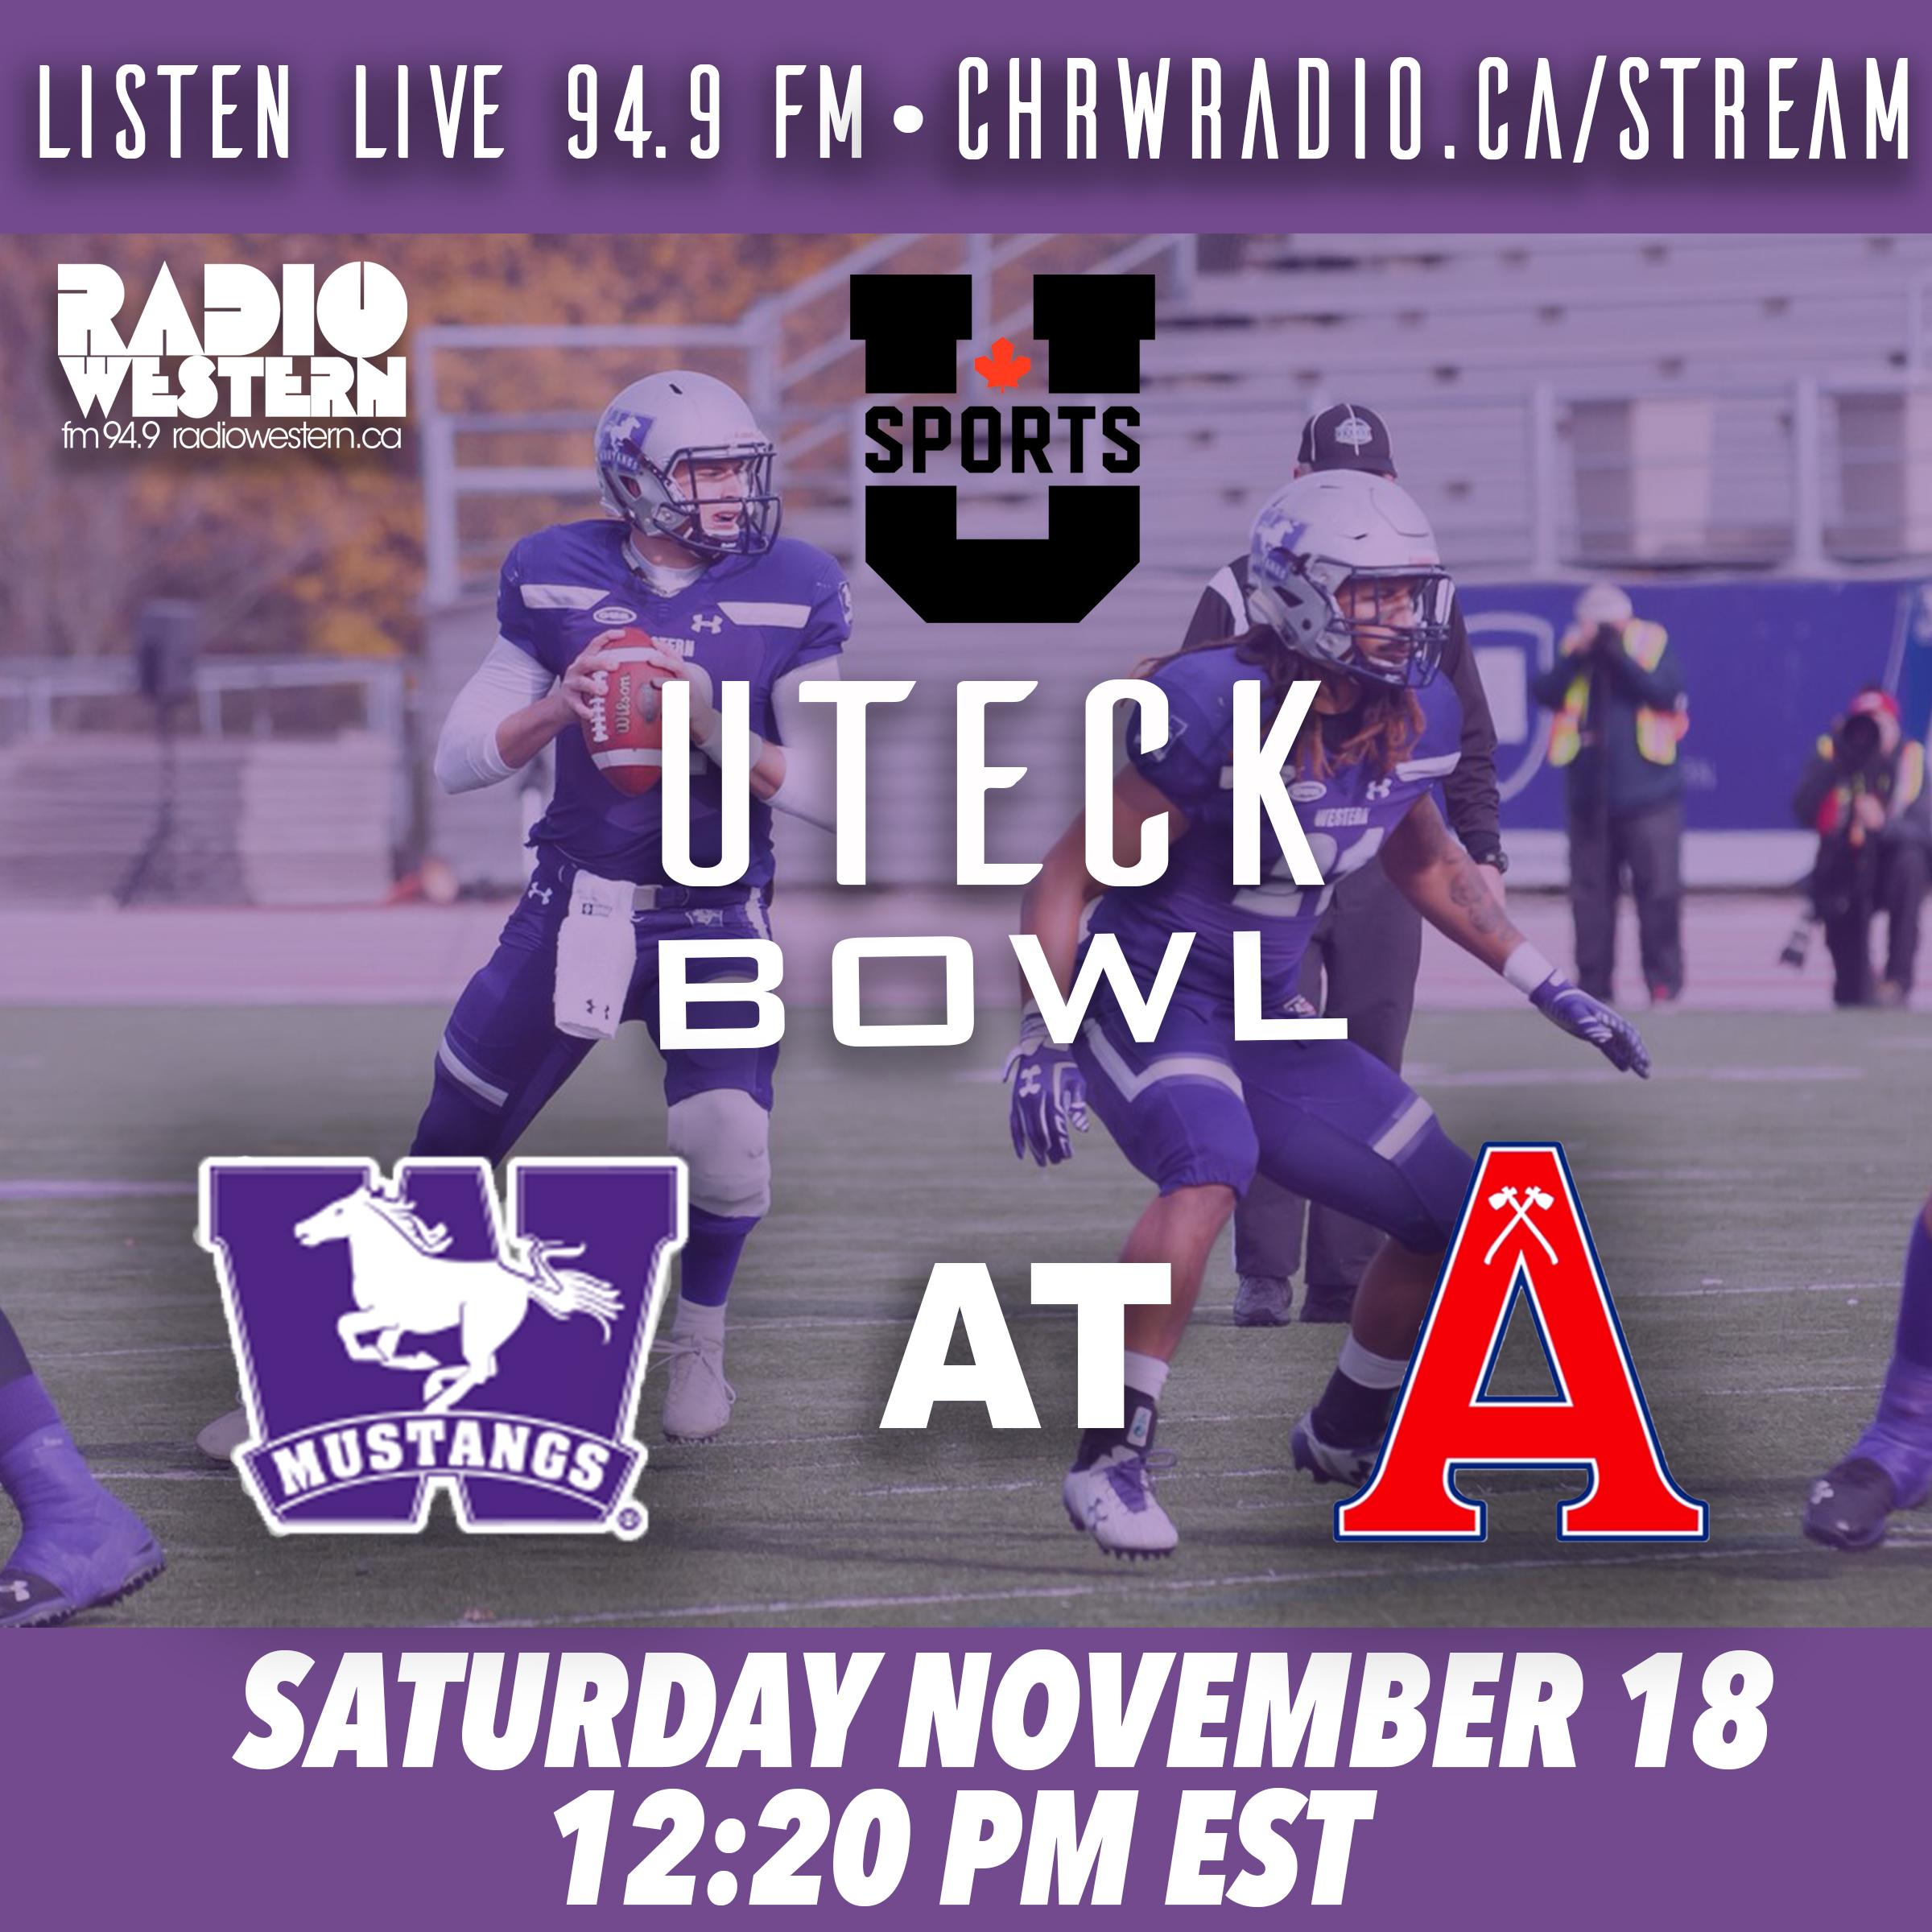 Live Stream of the Uteck Bowl